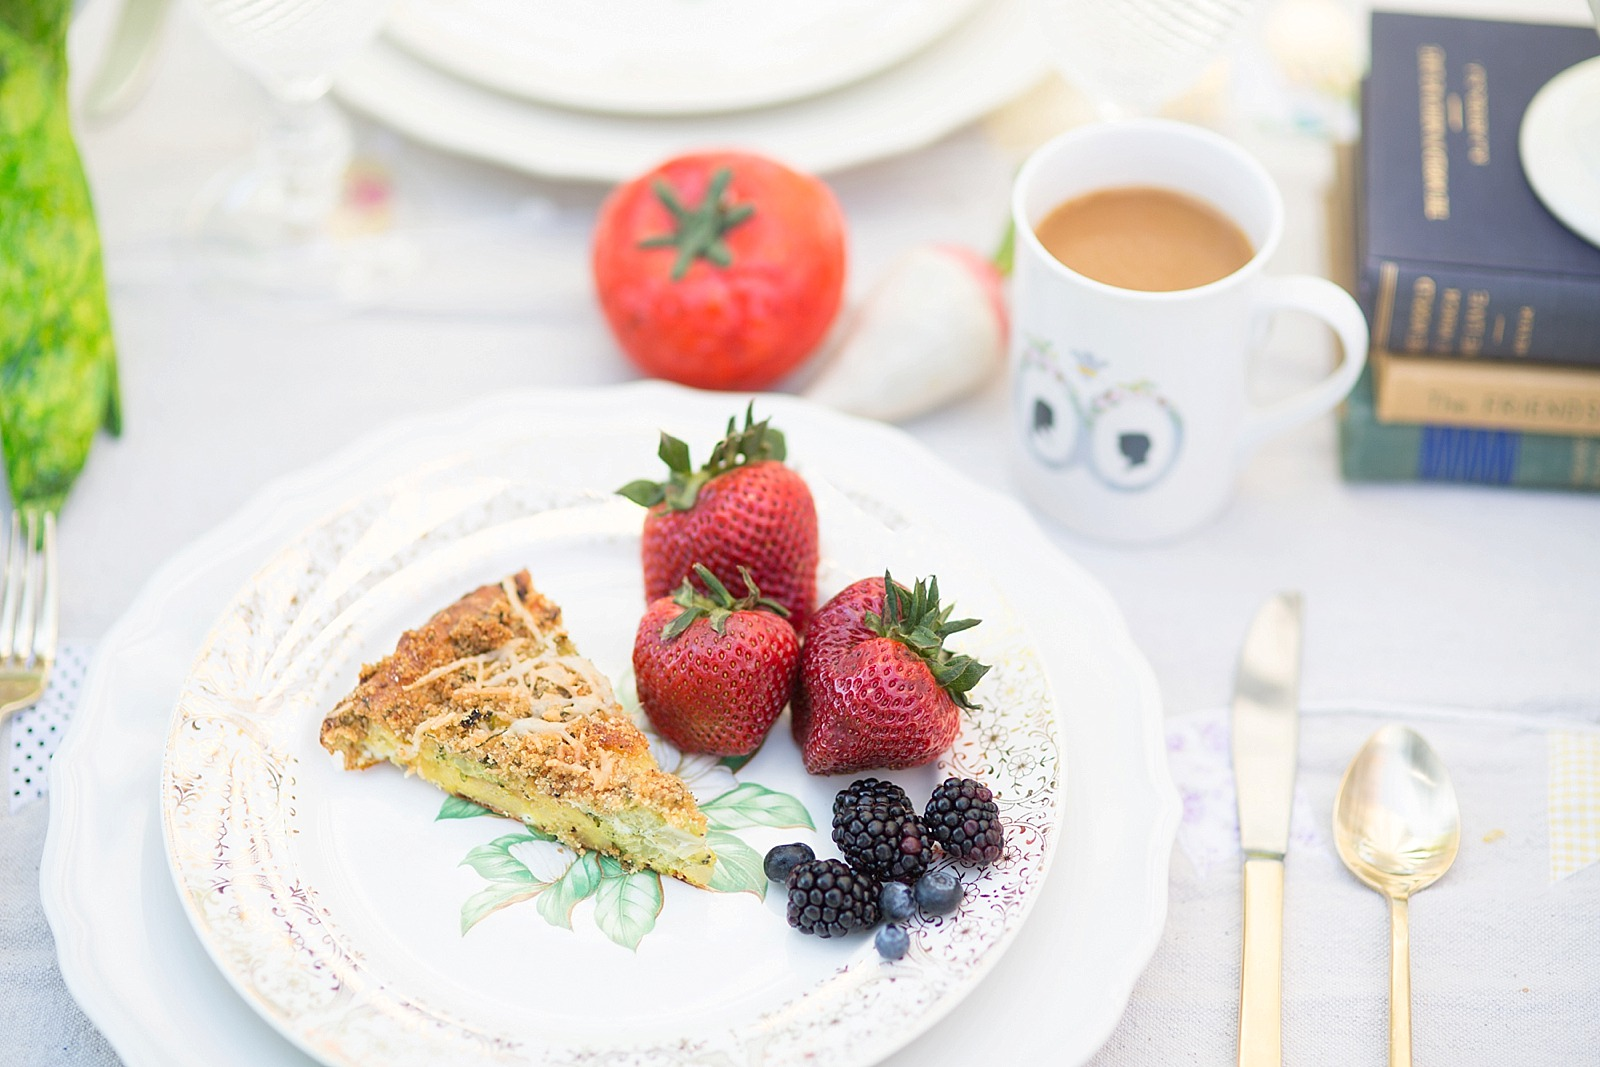 diana-elizabeth-blog-lifestyle-dunkin-creamers-dunkin-donuts-brunch-book-club--4582